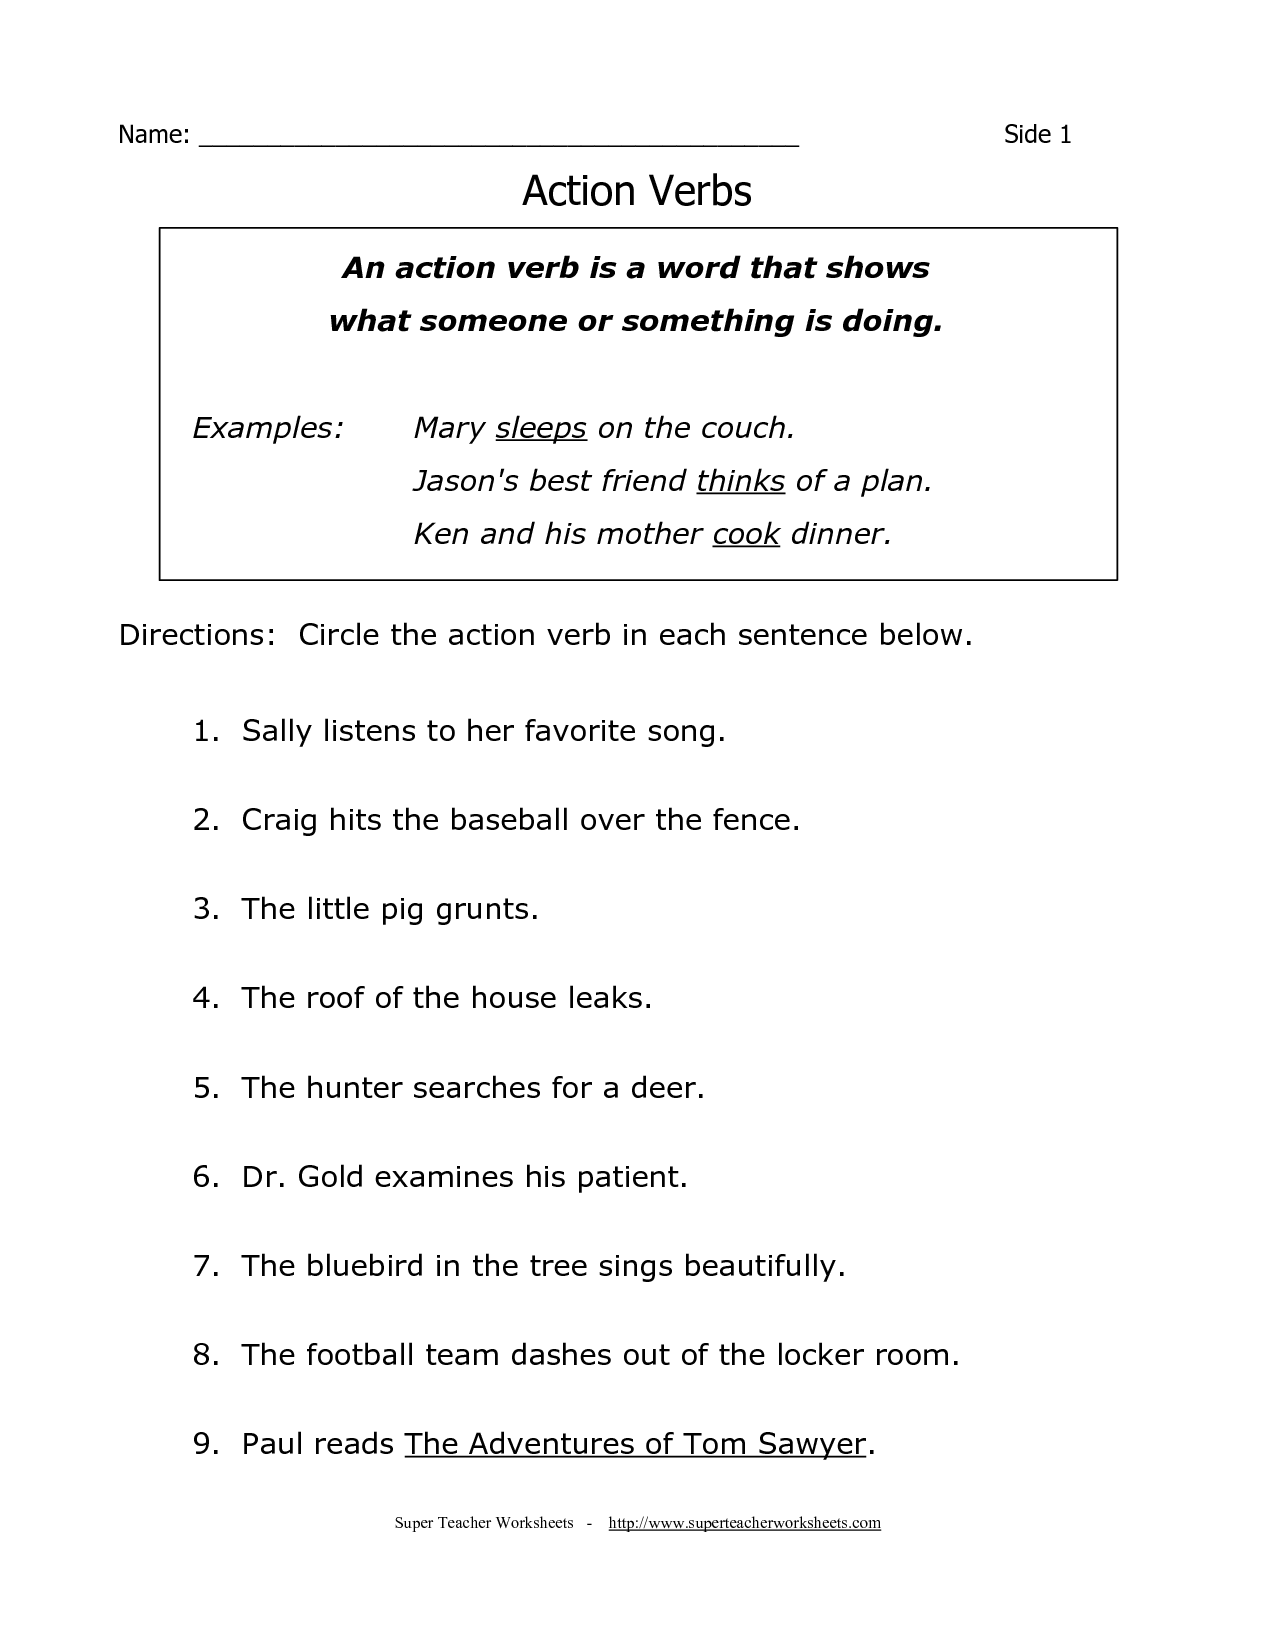 English Grammar Worksheets 4th Grade The Best Worksheets Image